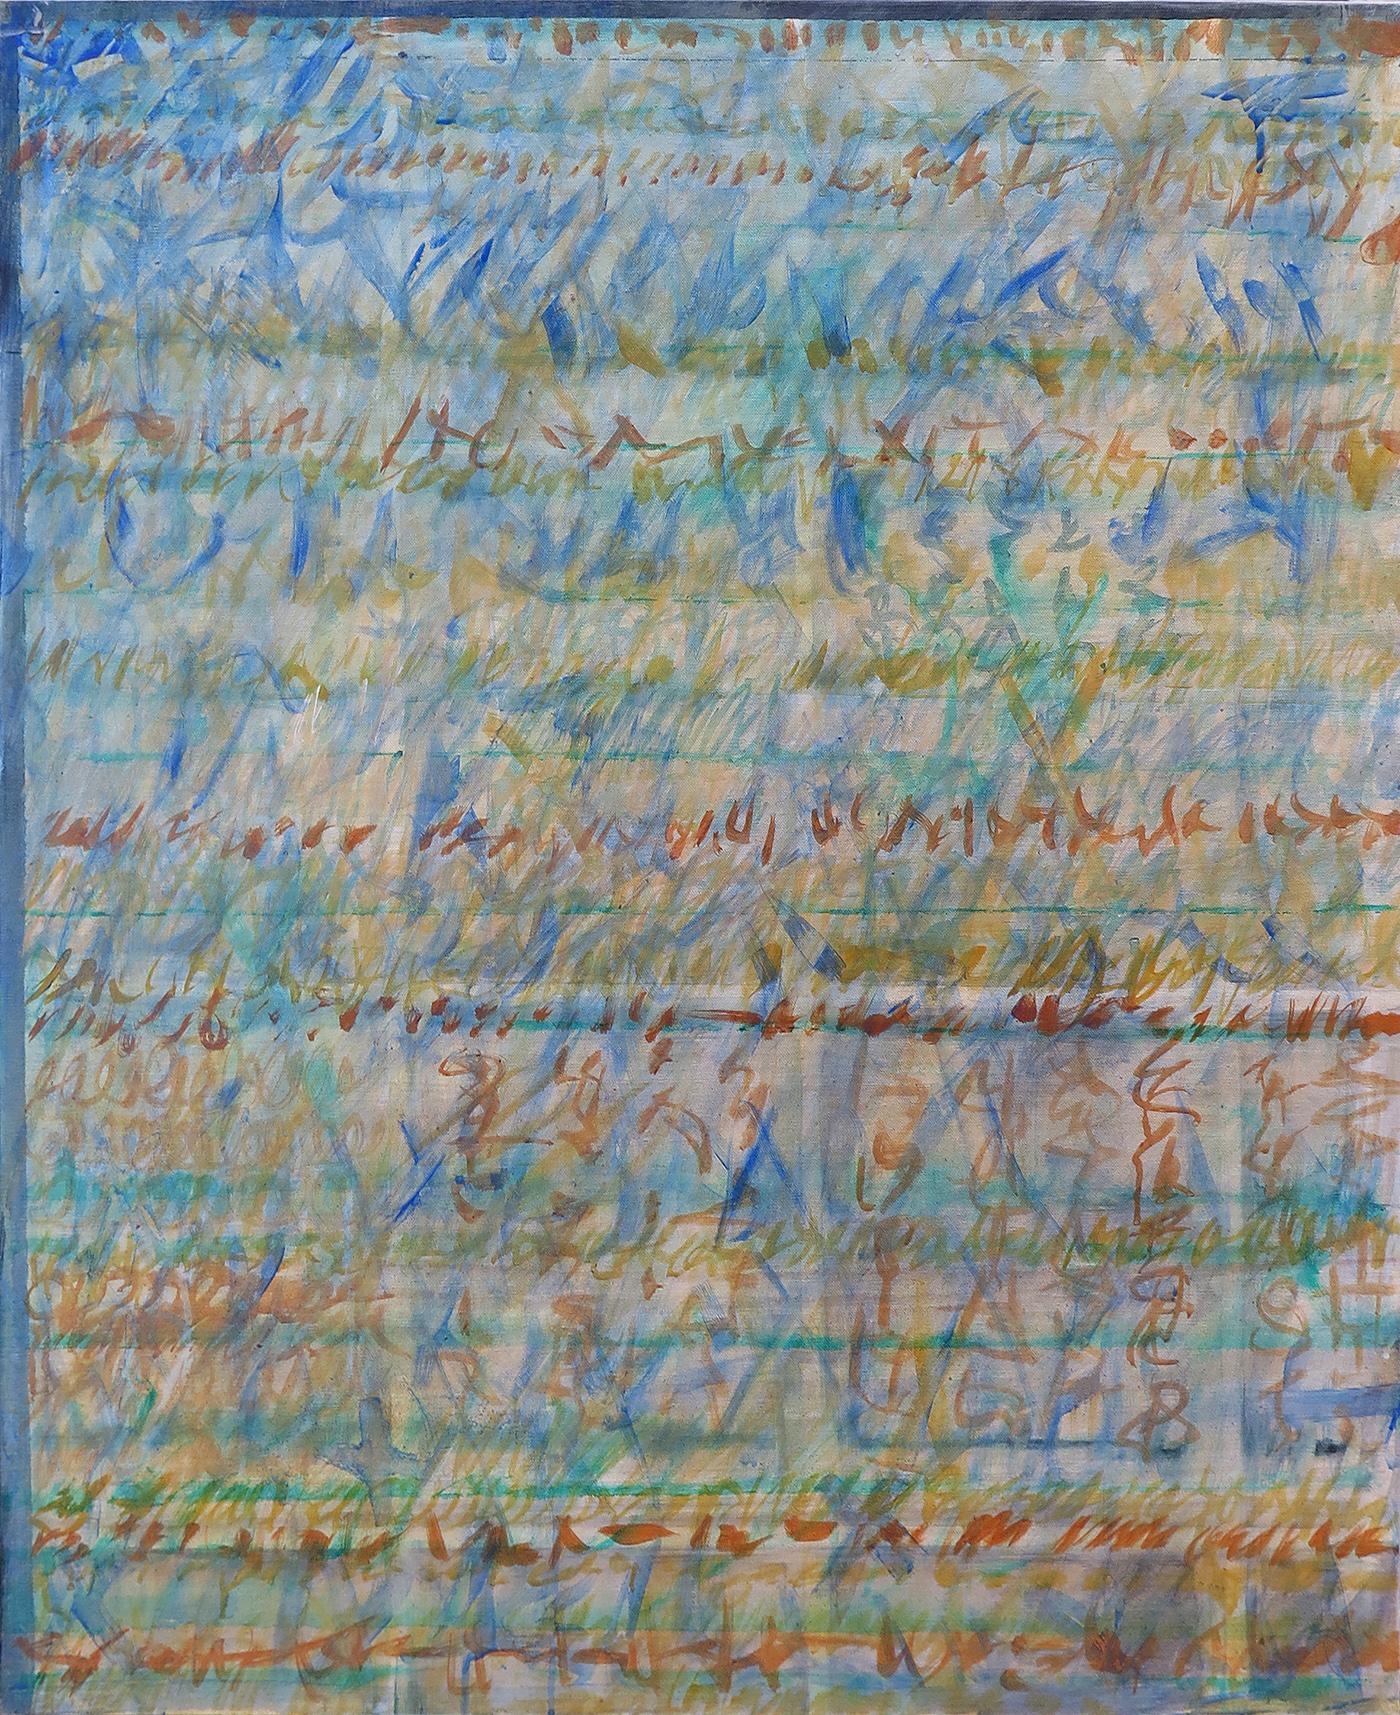 Acrílico sobre tela, 100 x 81 cm